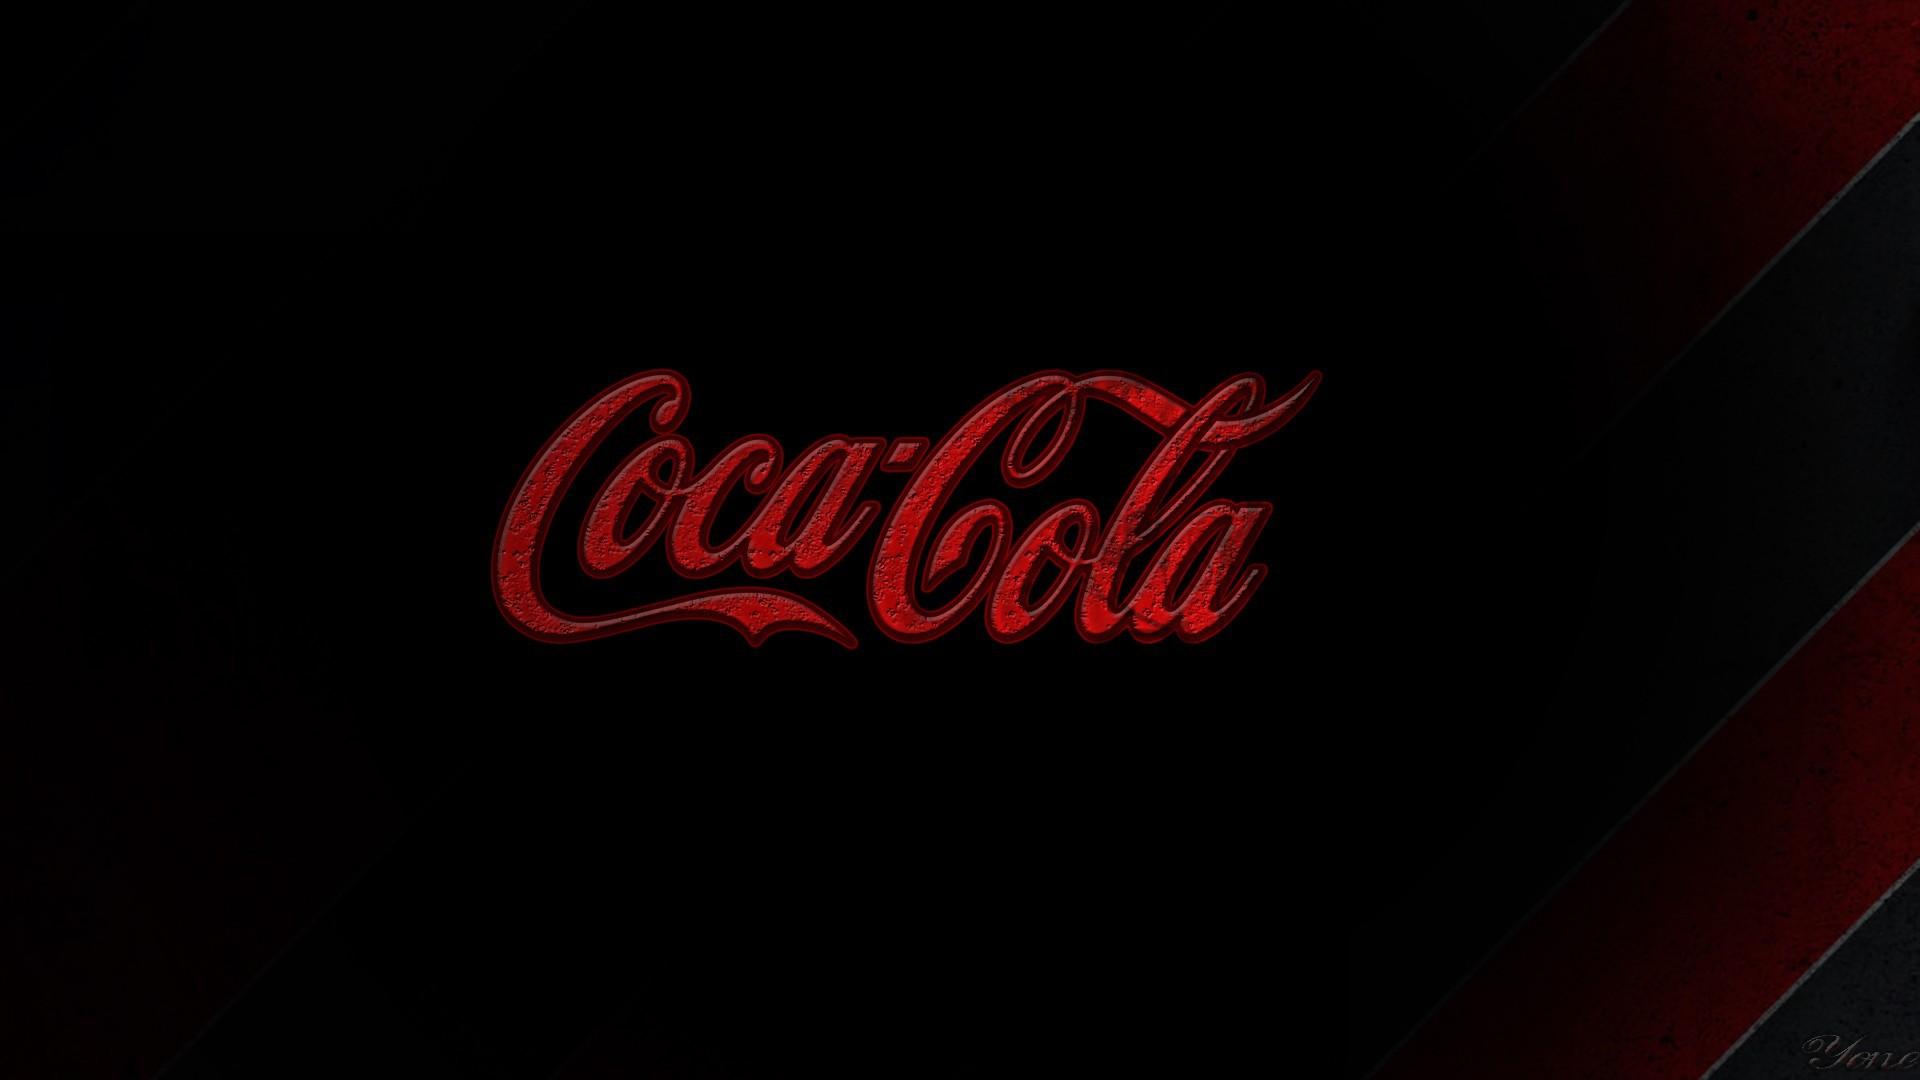 pin coca cola black on pinterest. Black Bedroom Furniture Sets. Home Design Ideas